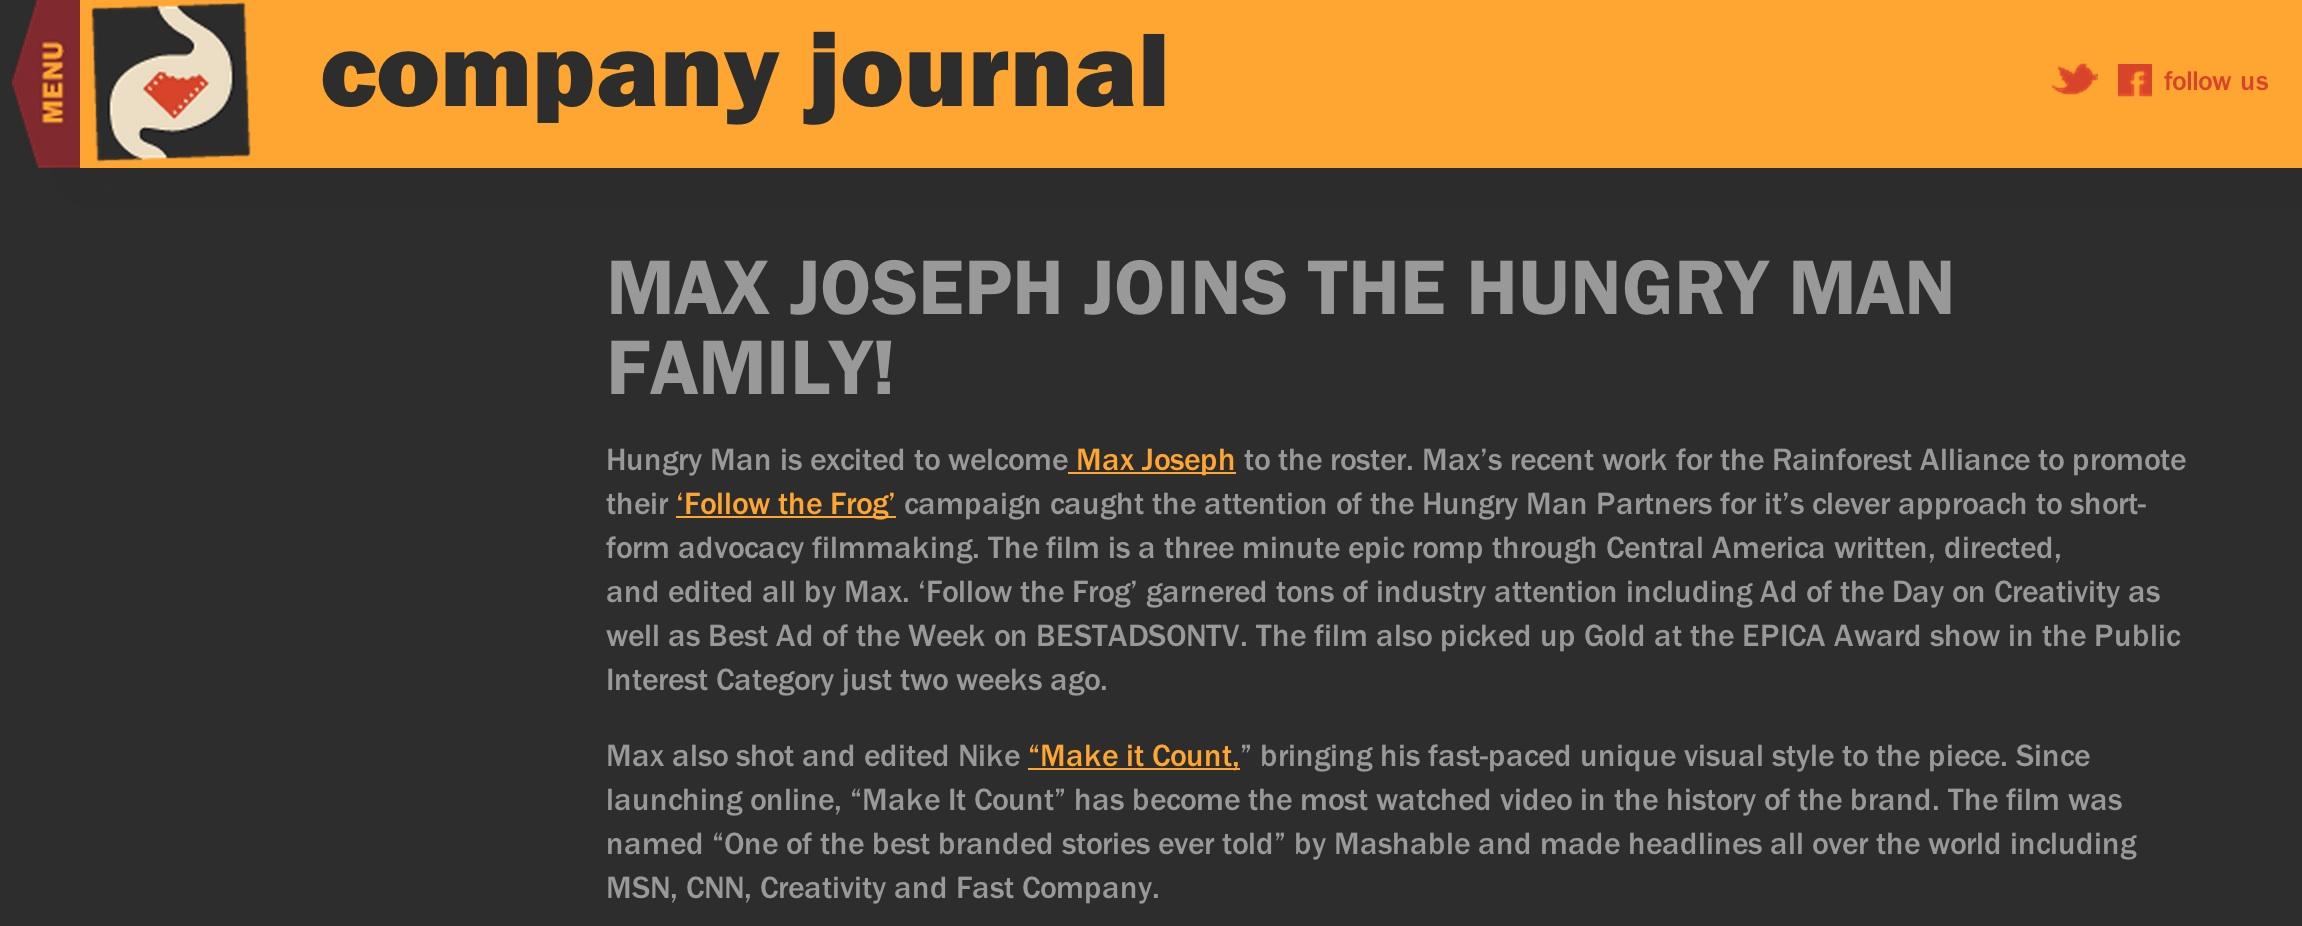 Max Joins Hungryman.jpg